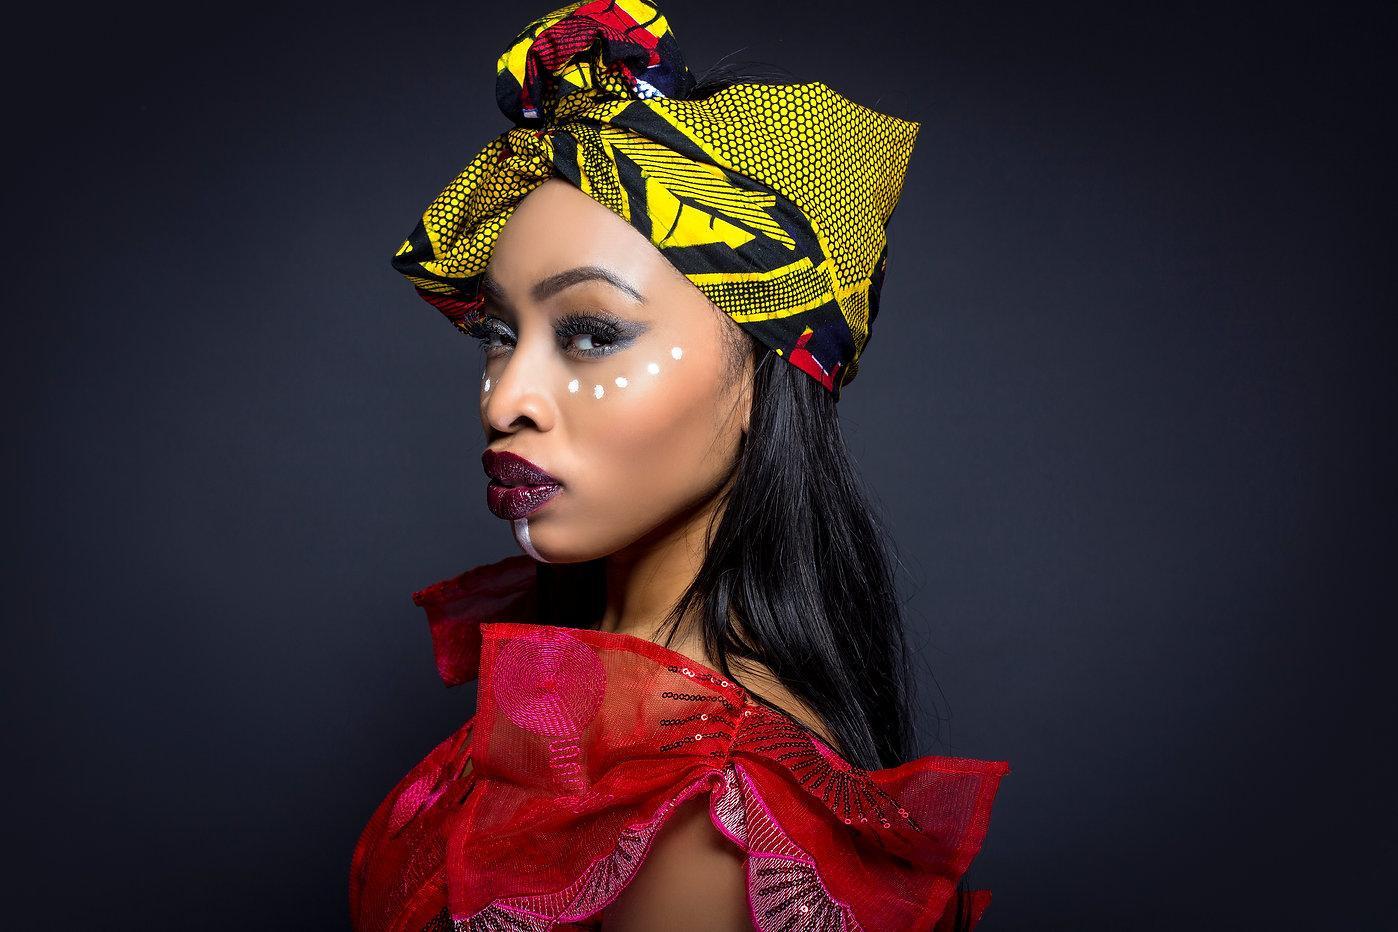 Black female showing African pride by we